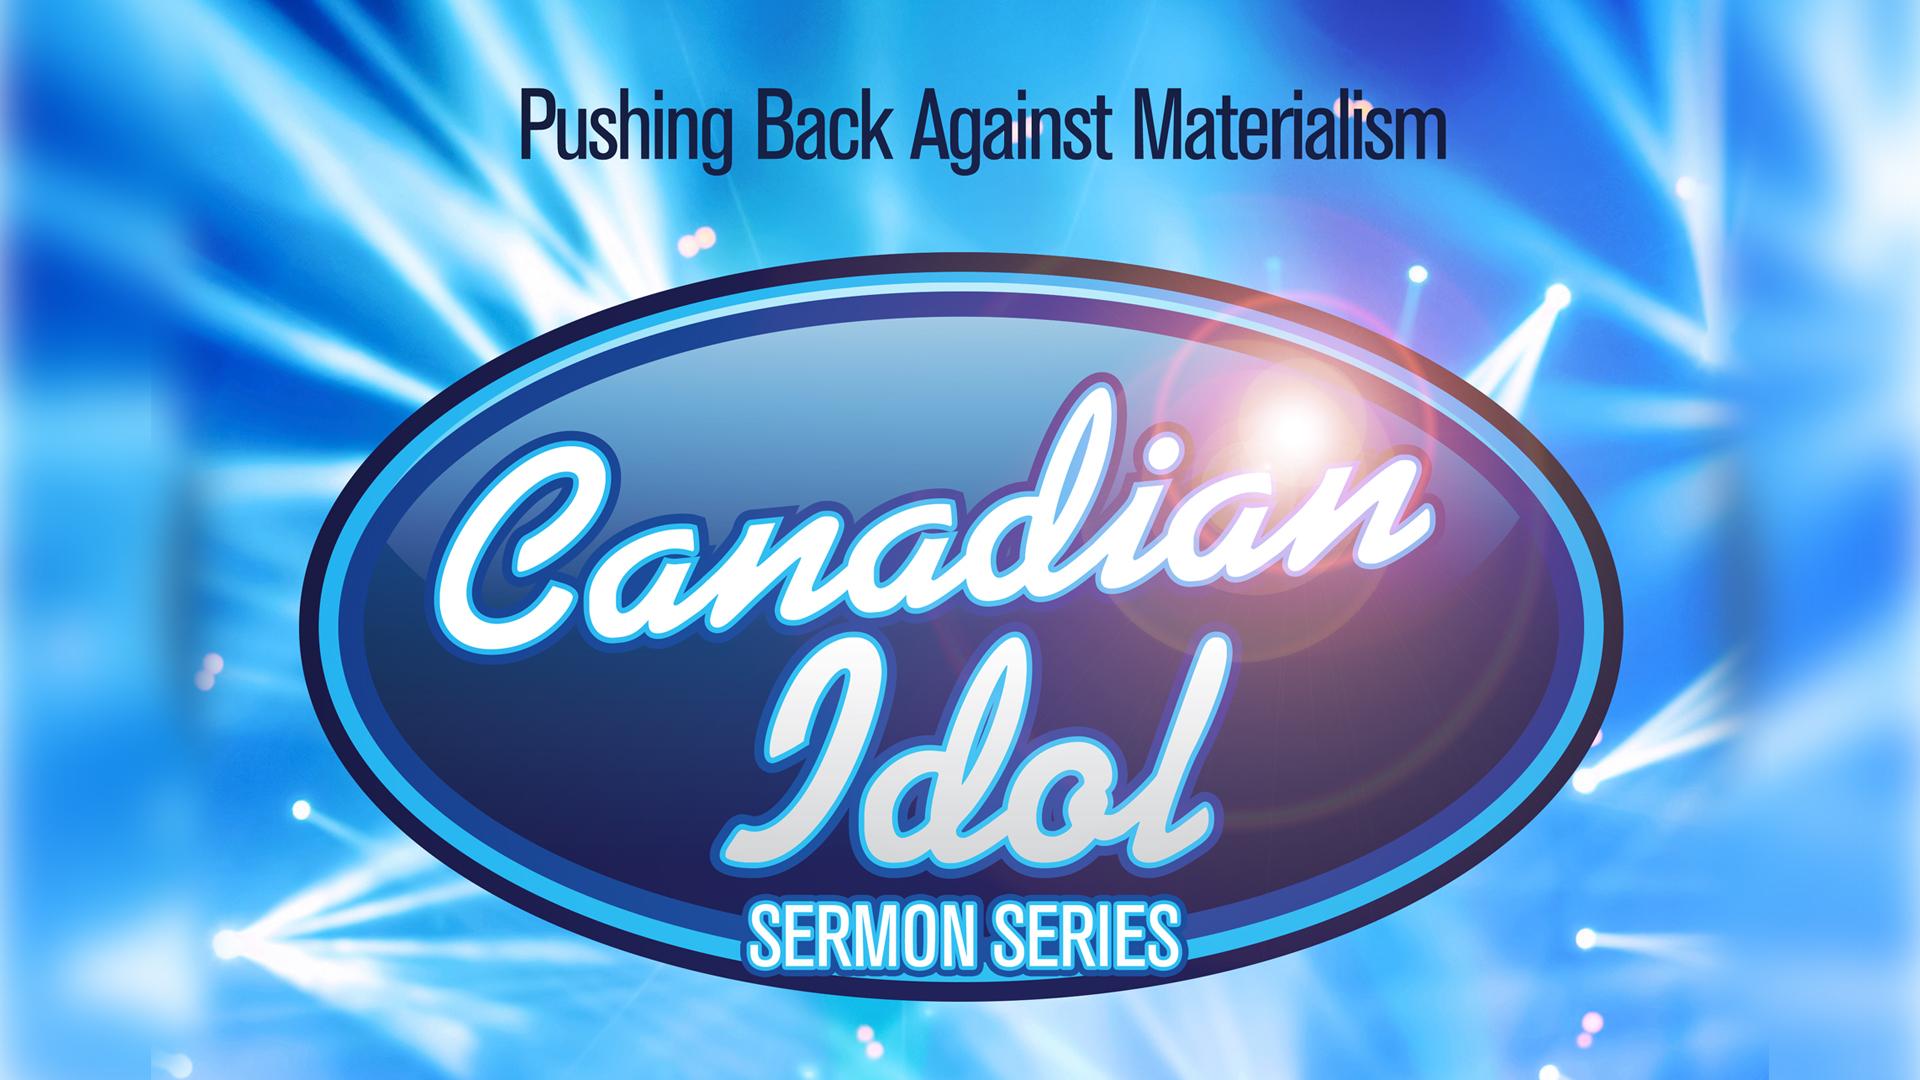 Website sermon - CANADIAN IDOL.jpg